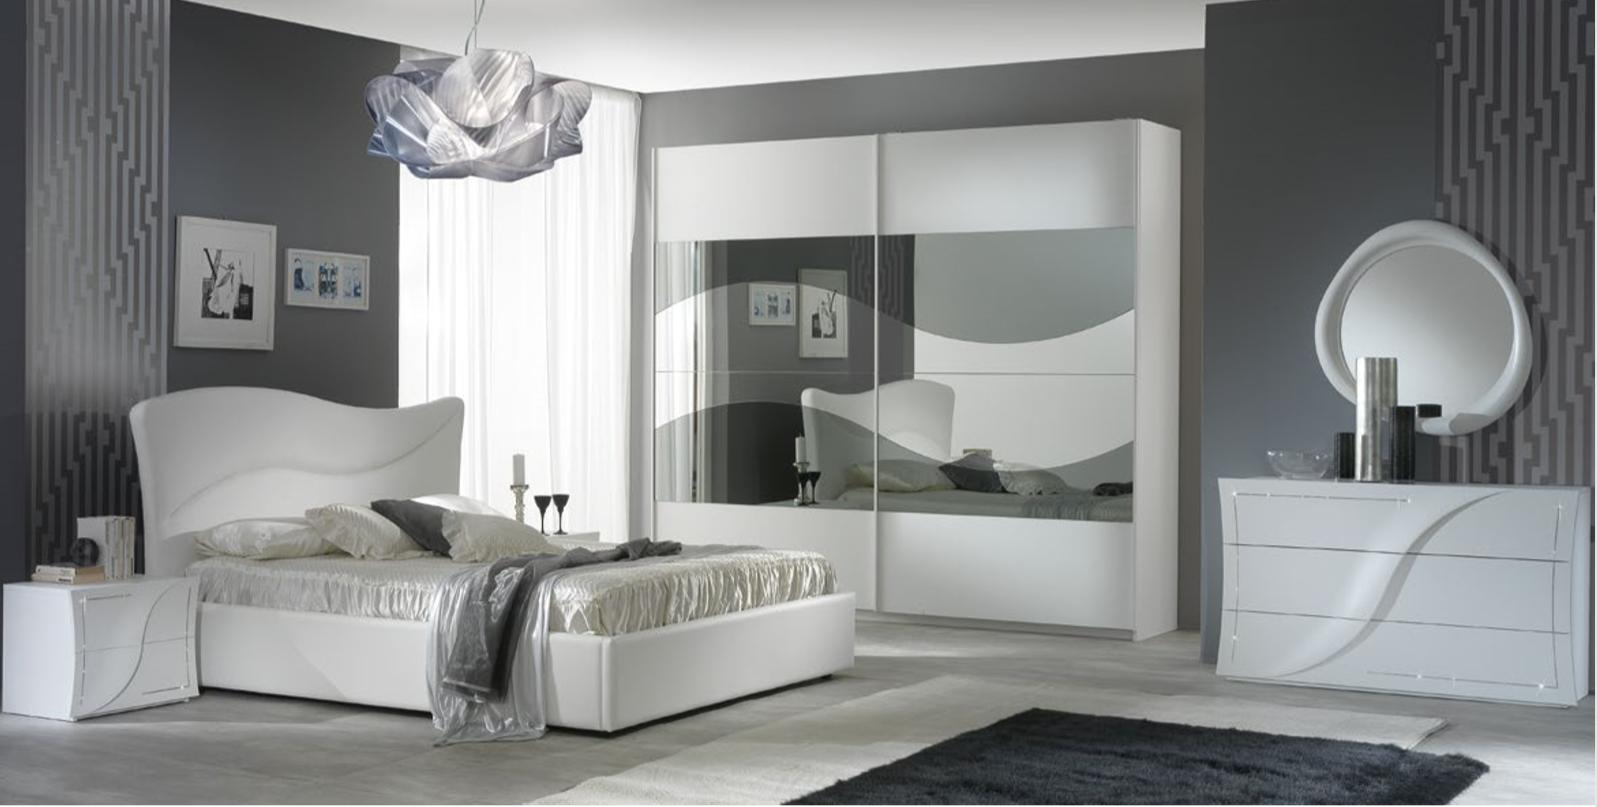 Camera da letto moderna/contemporanea - 1